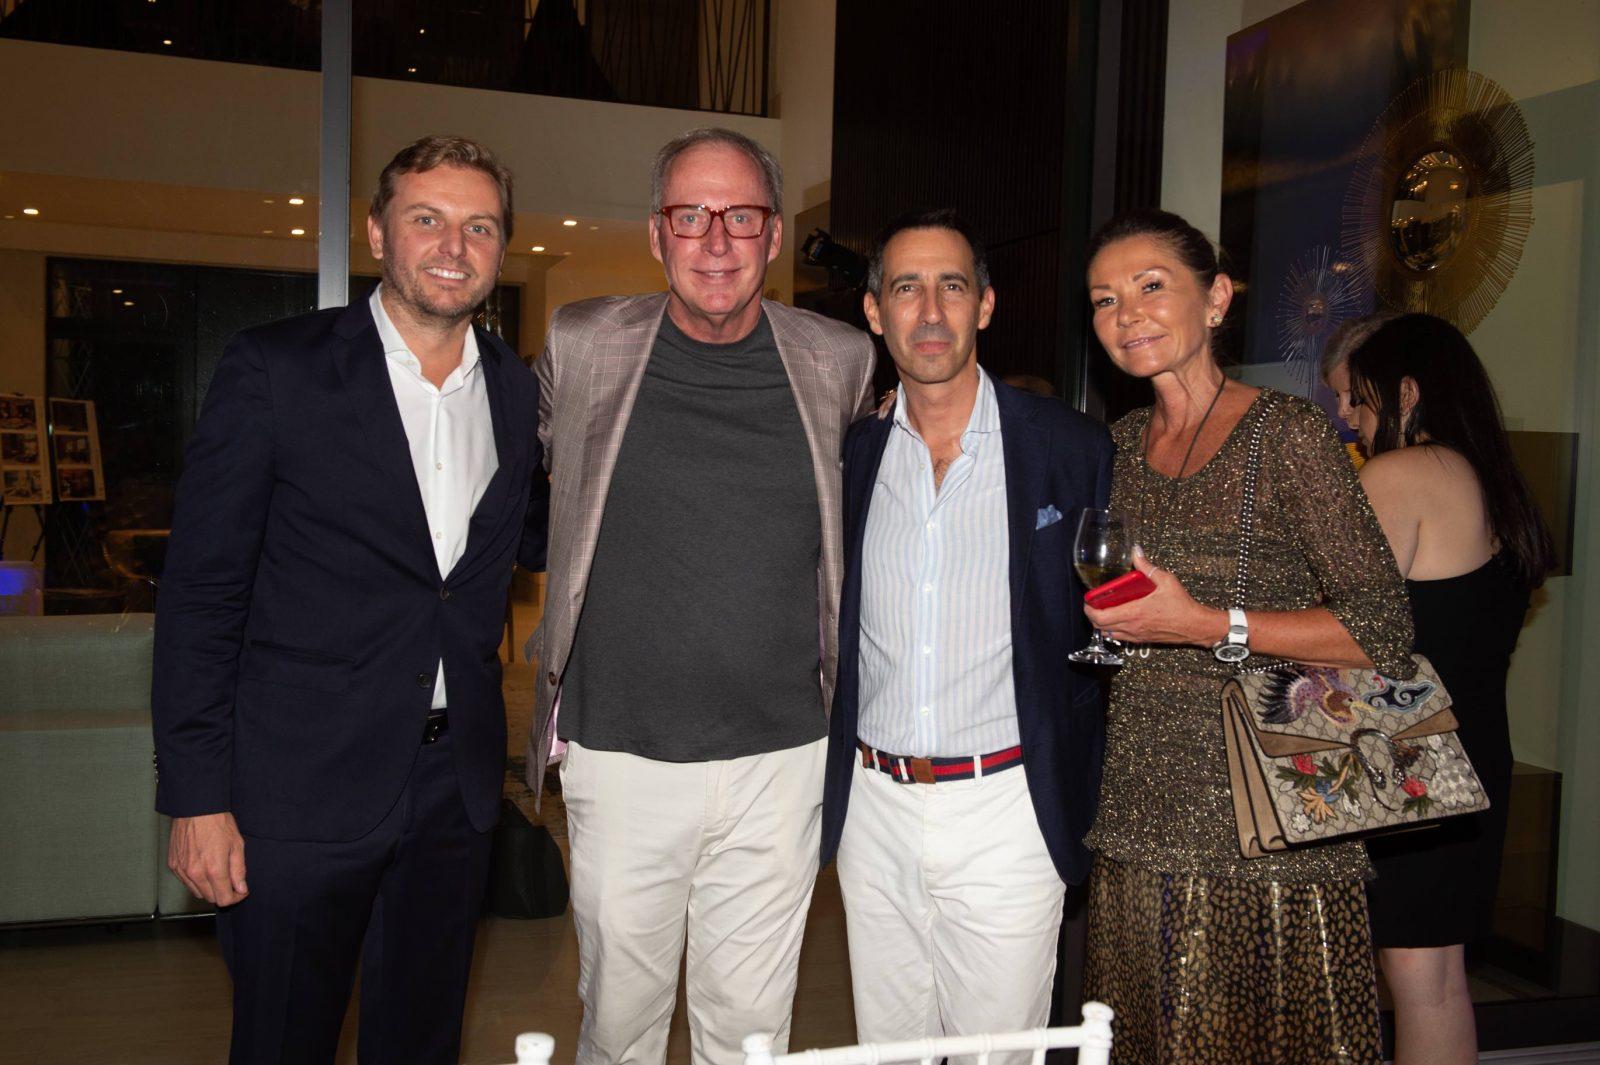 Martin Fritsches, Frank Biderman, Francois-Xavier Hotier and Francoise Bezzola